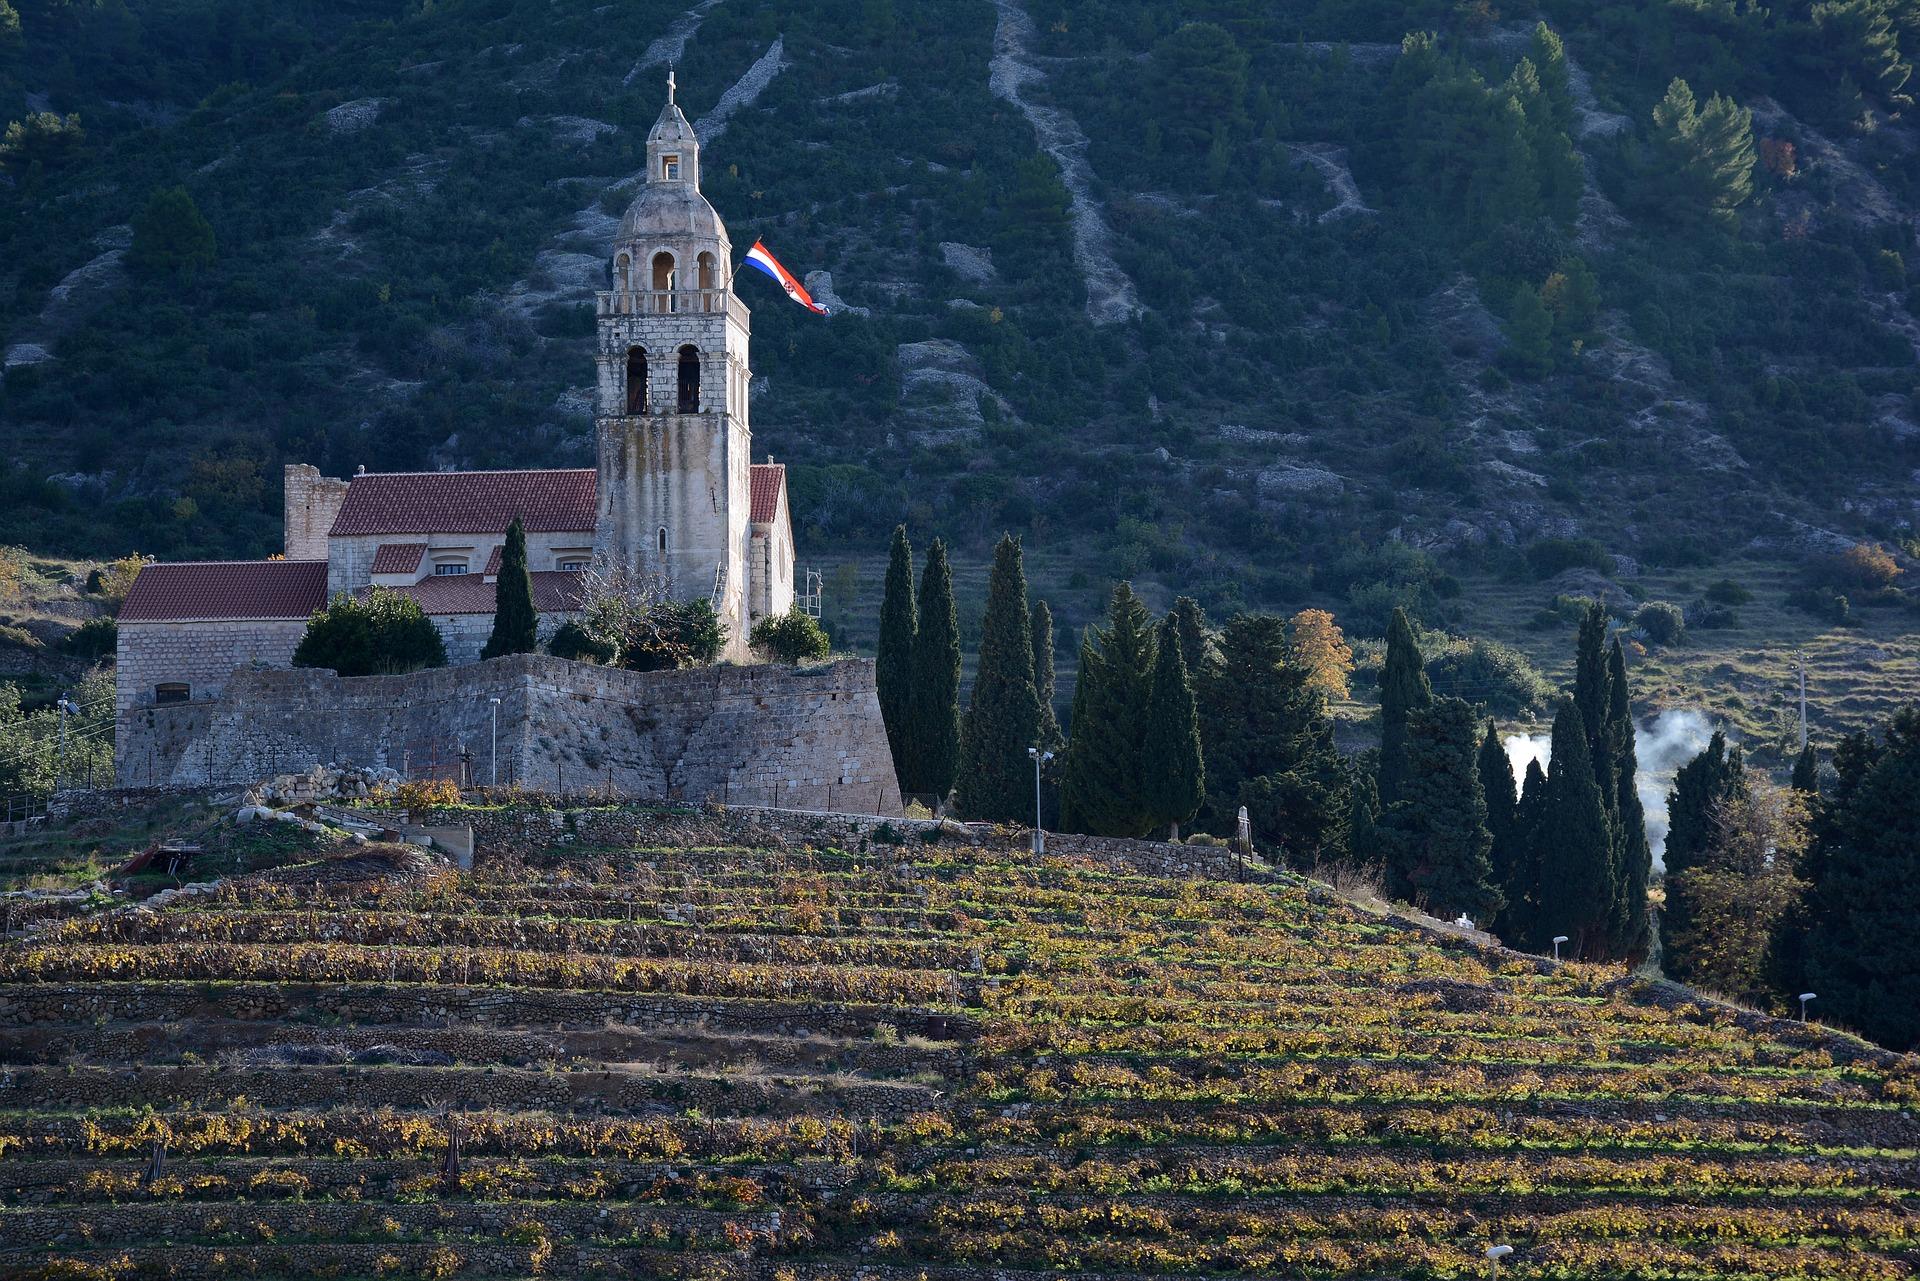 wp-content/uploads/itineraries/Croatia/croatia-vis-1.jpg